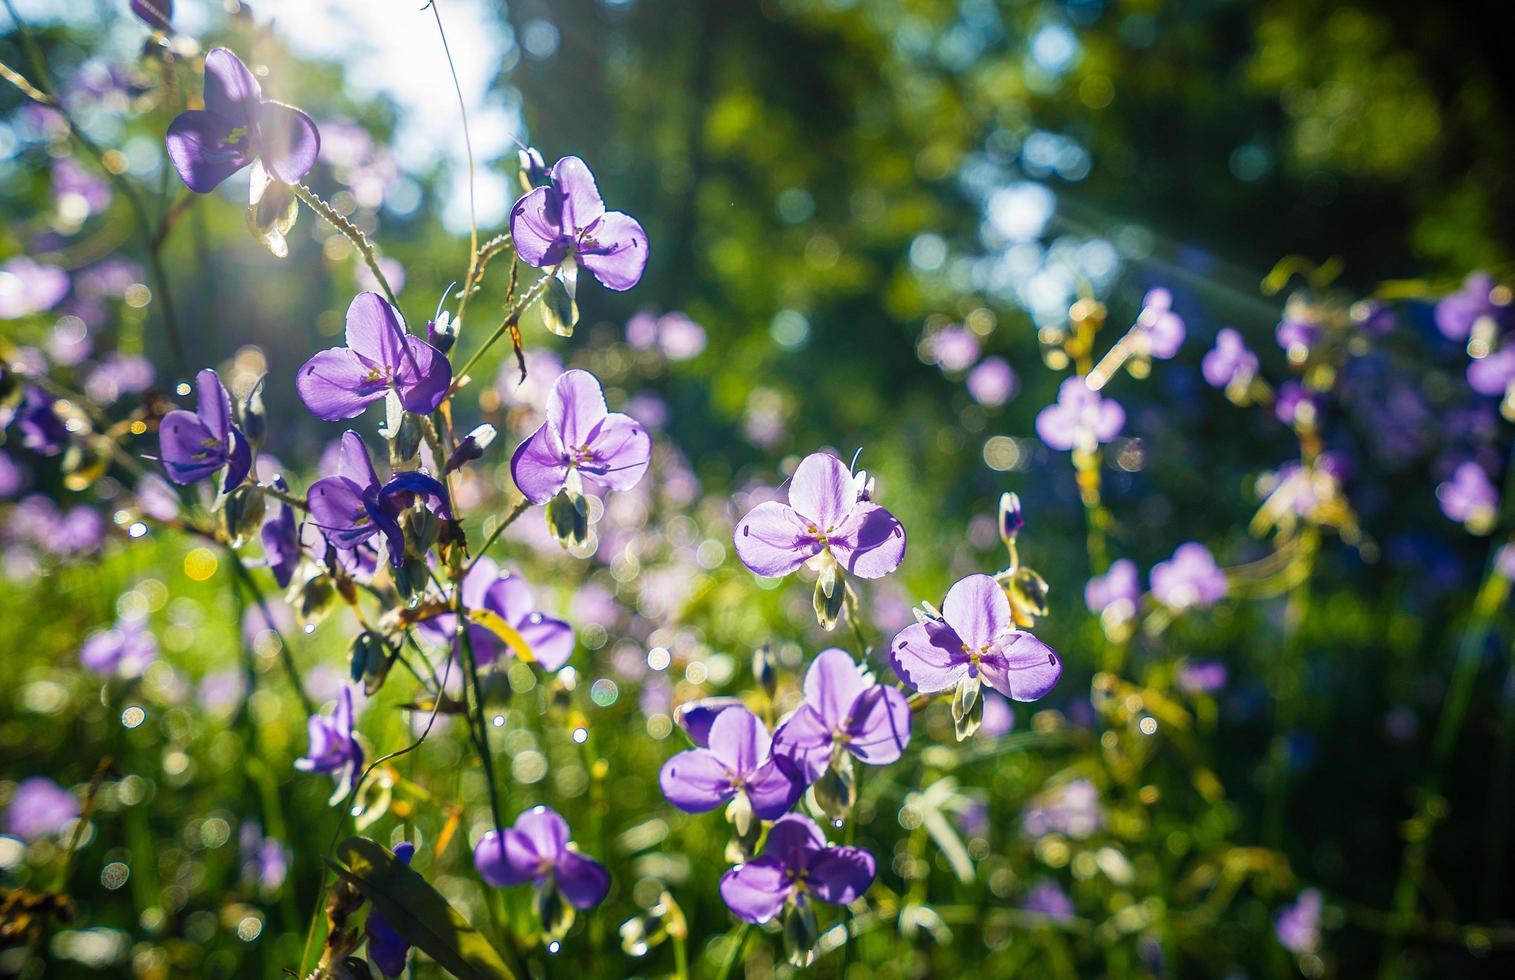 Haubenschlangenblumen im Garten foto